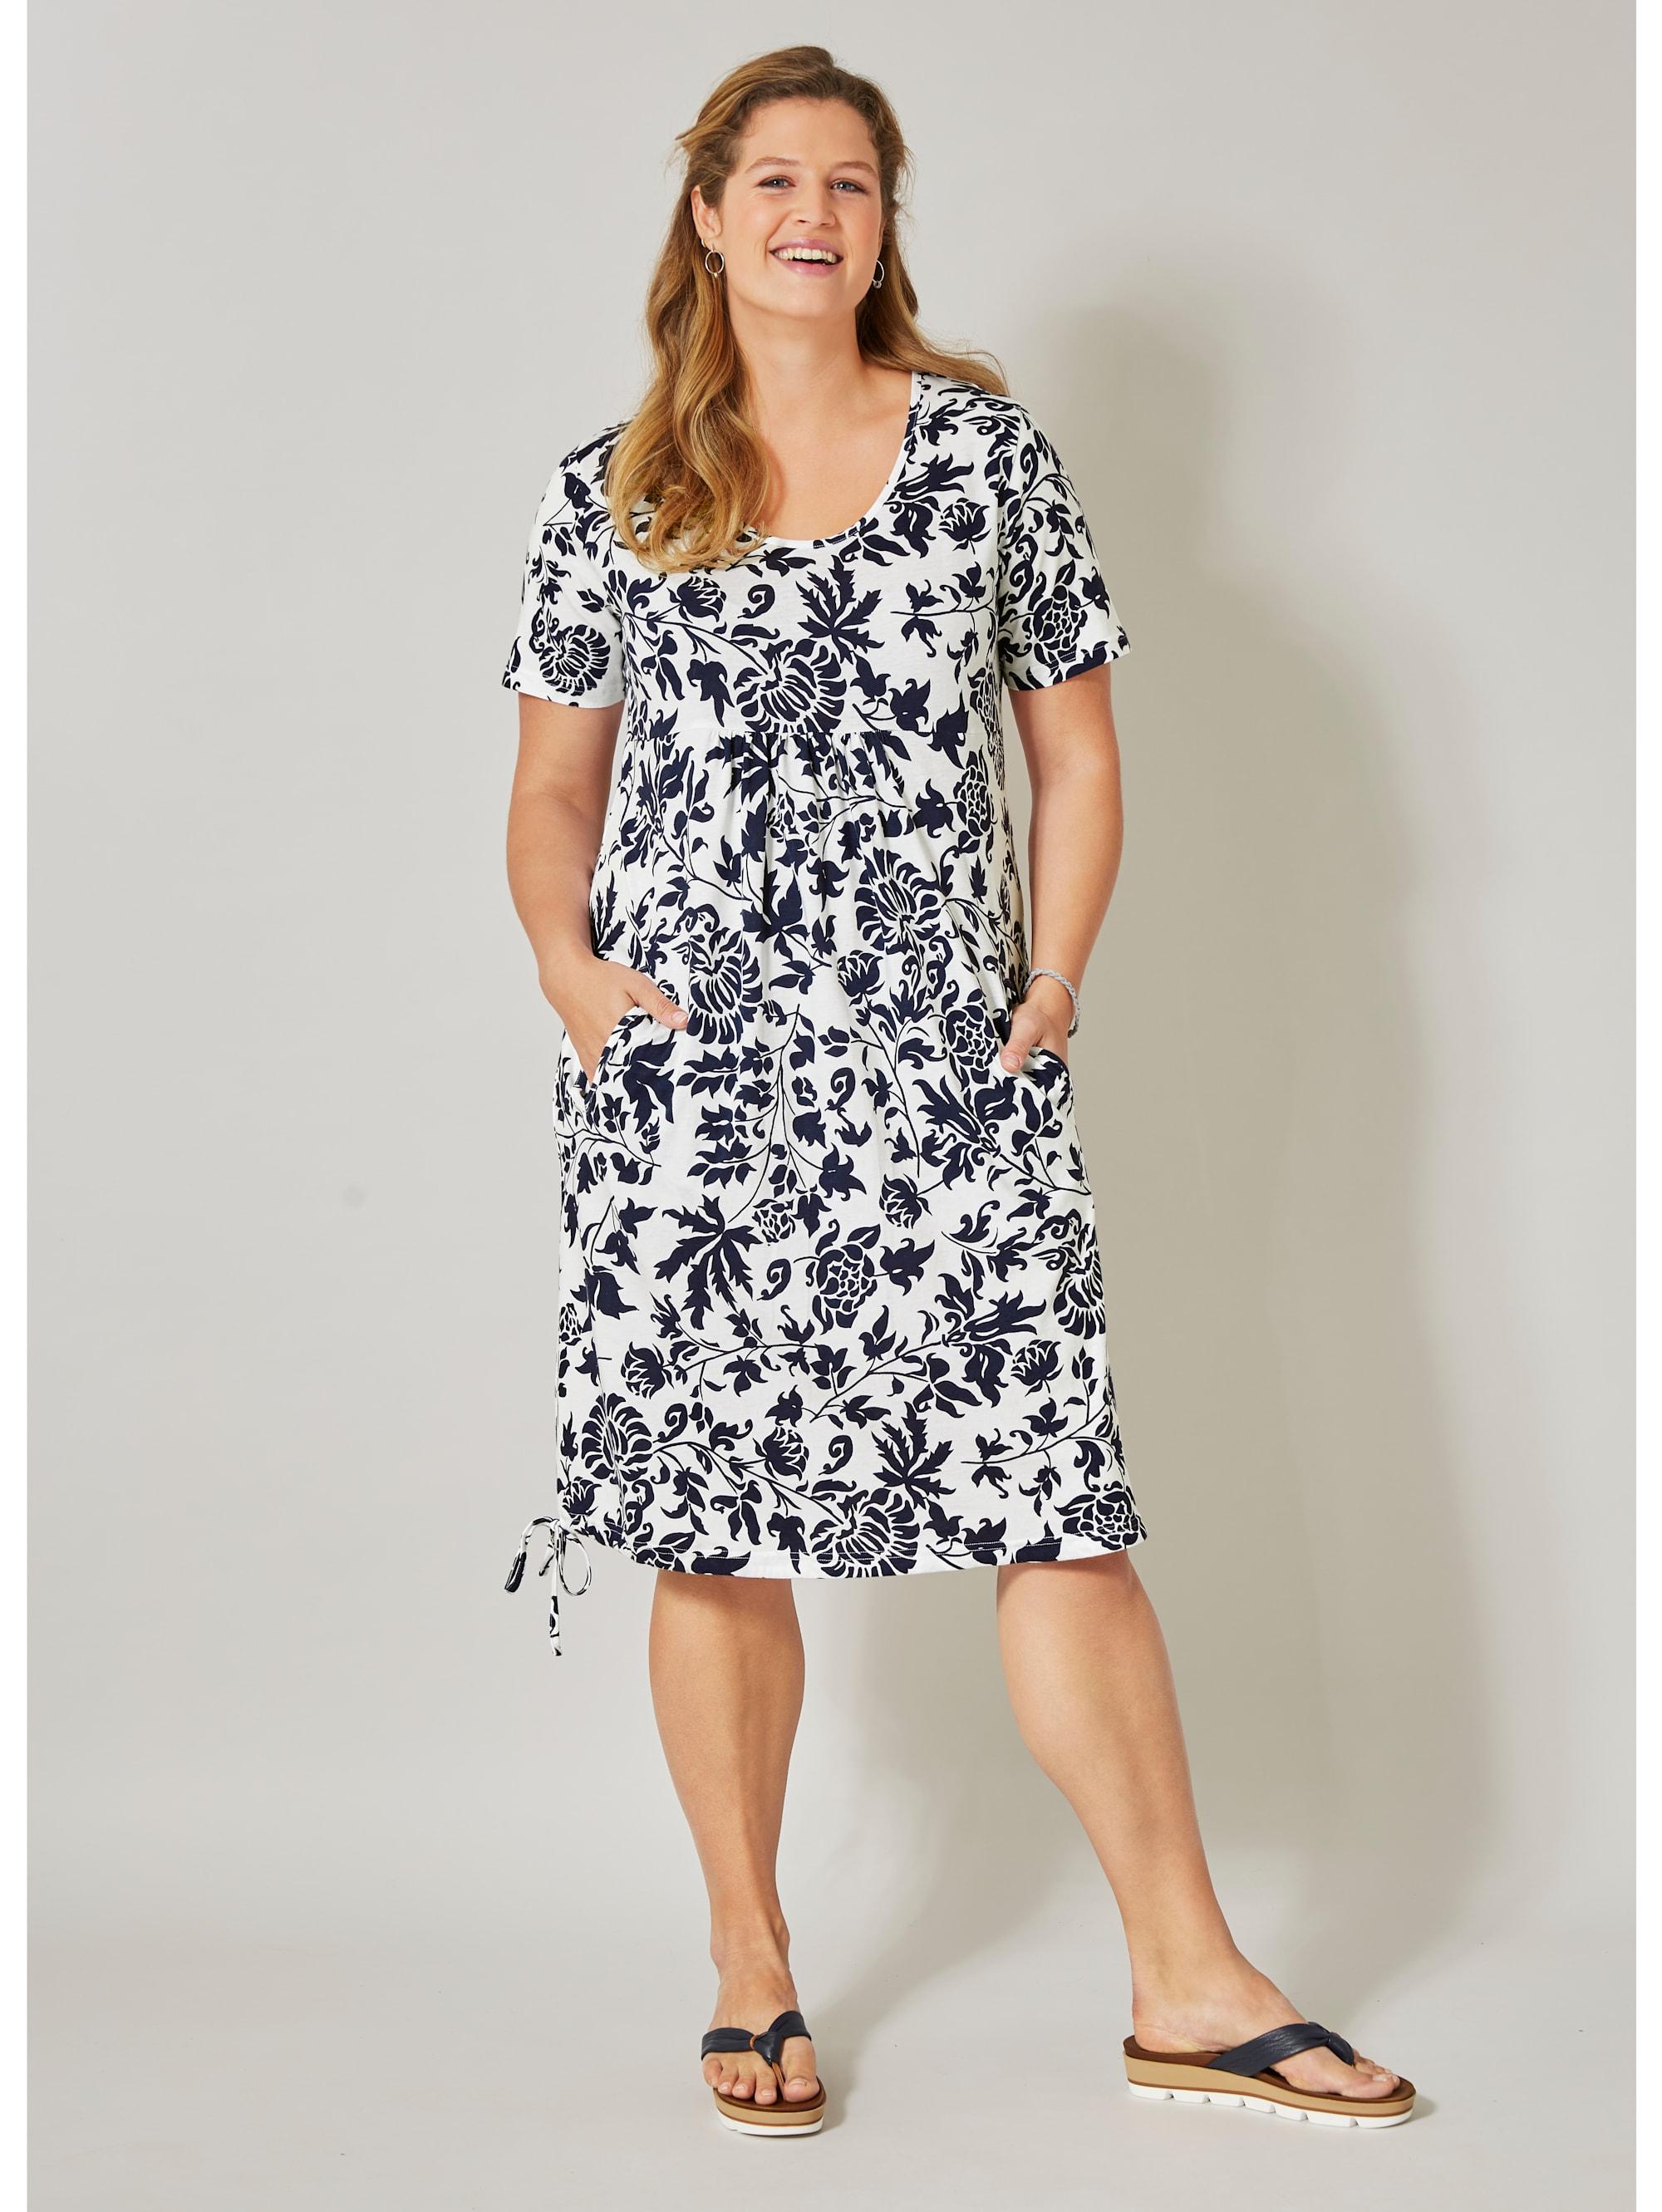 janet & joyce by happy size -  Jerseykleid mit Blumen-Print